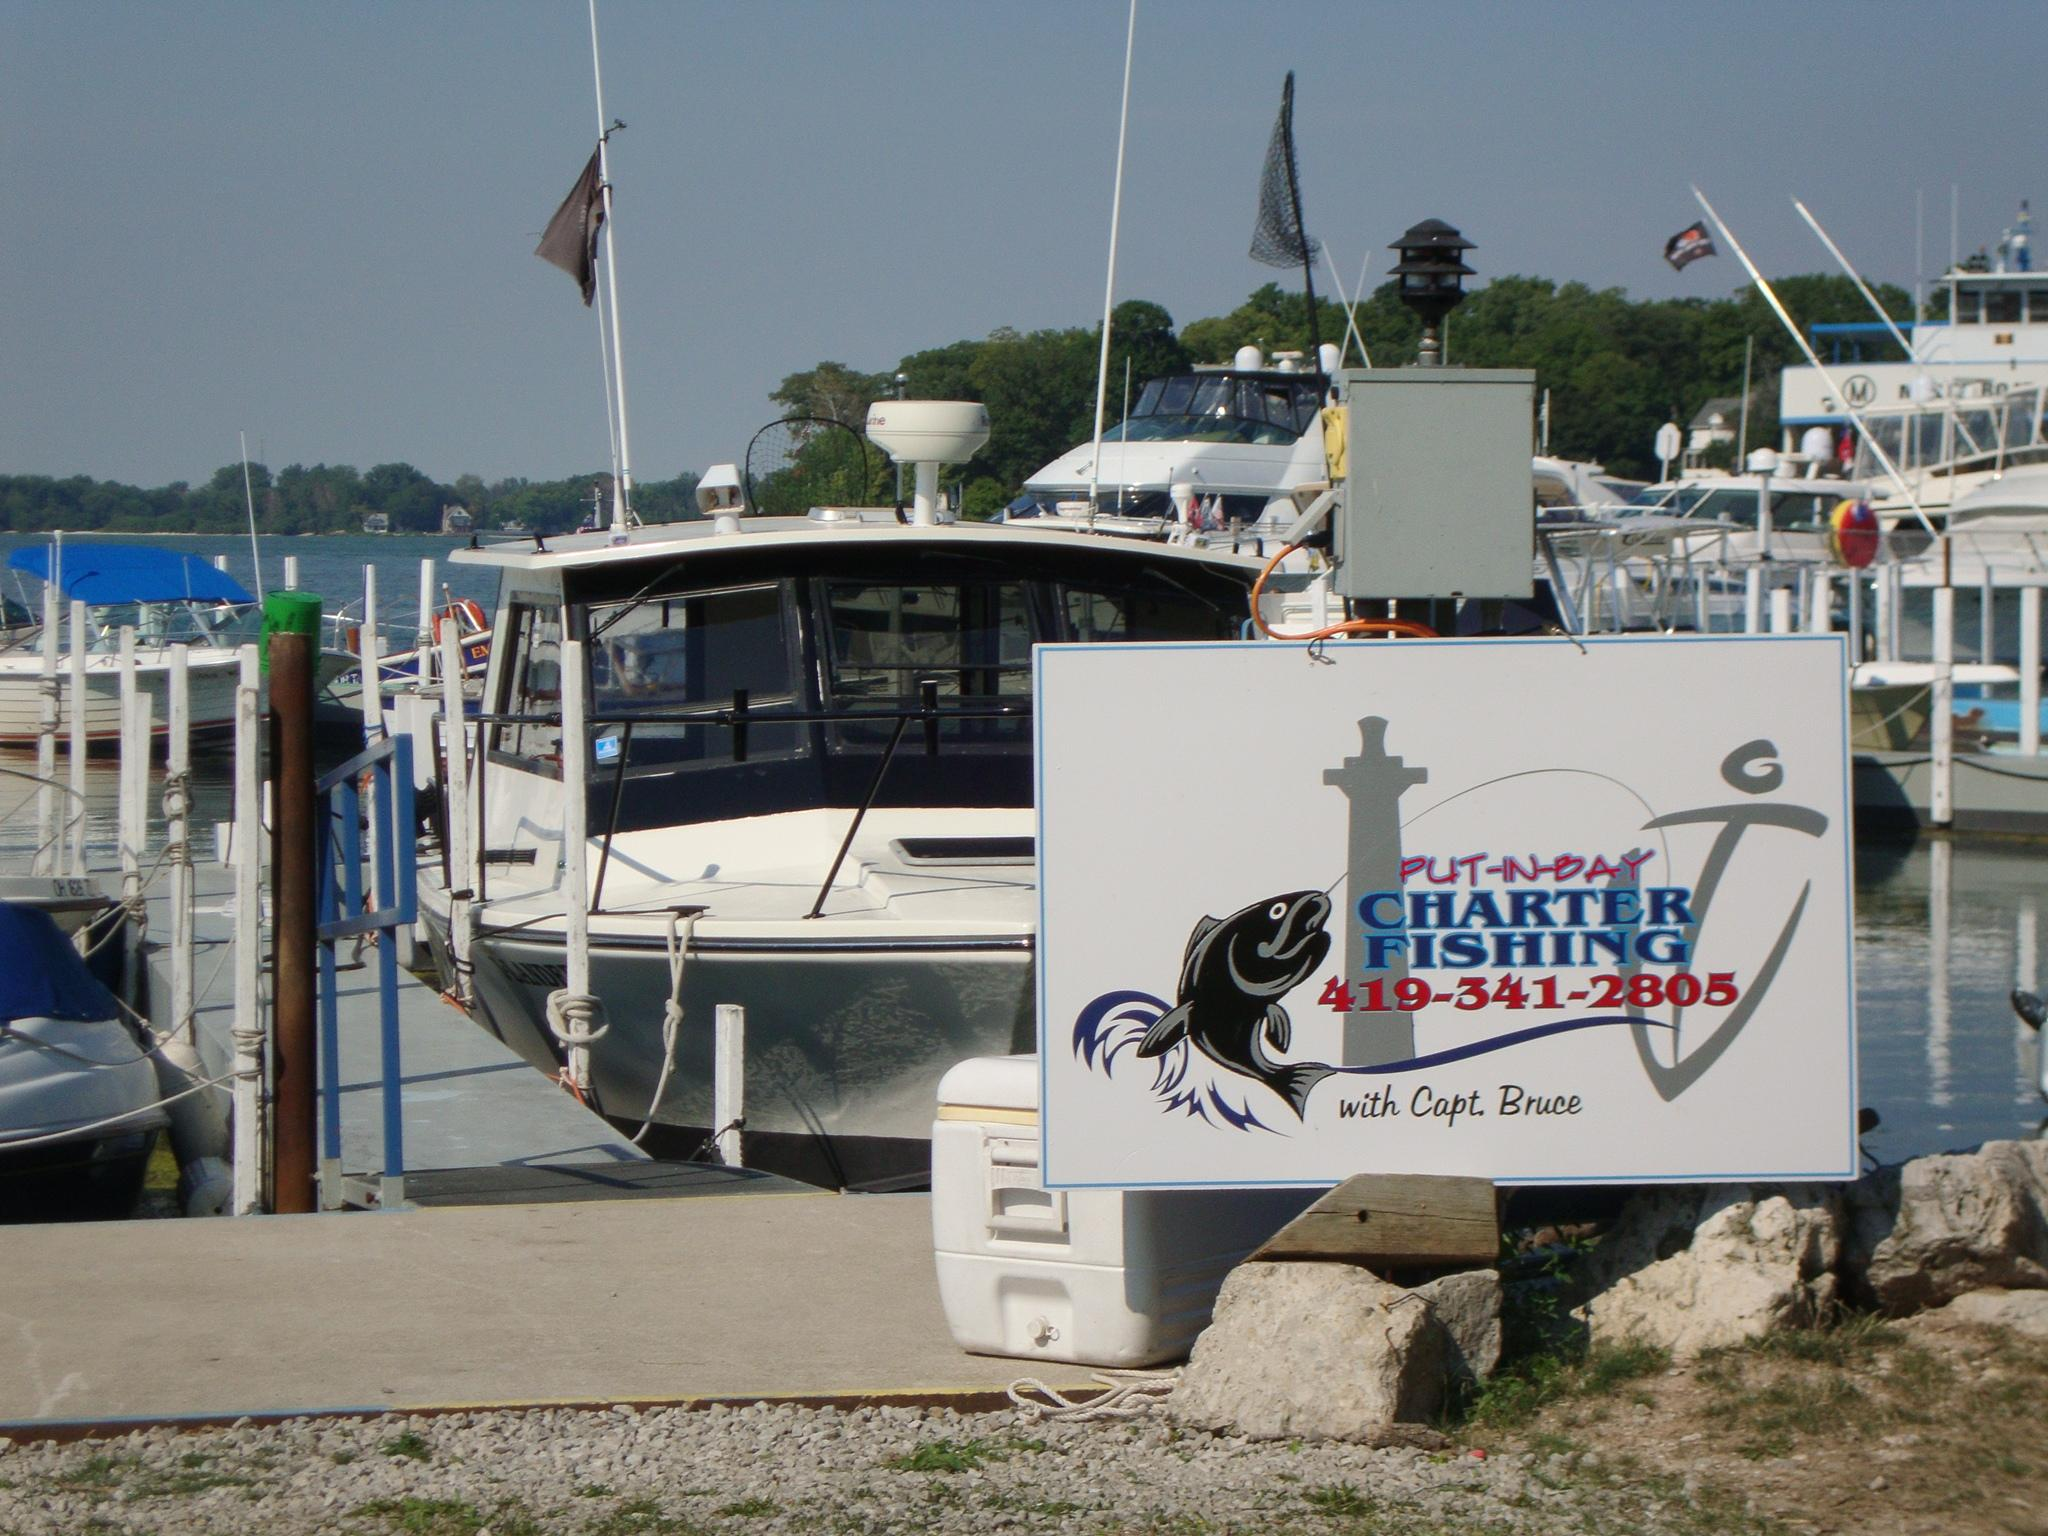 Put-in-Bay Charter Fishing